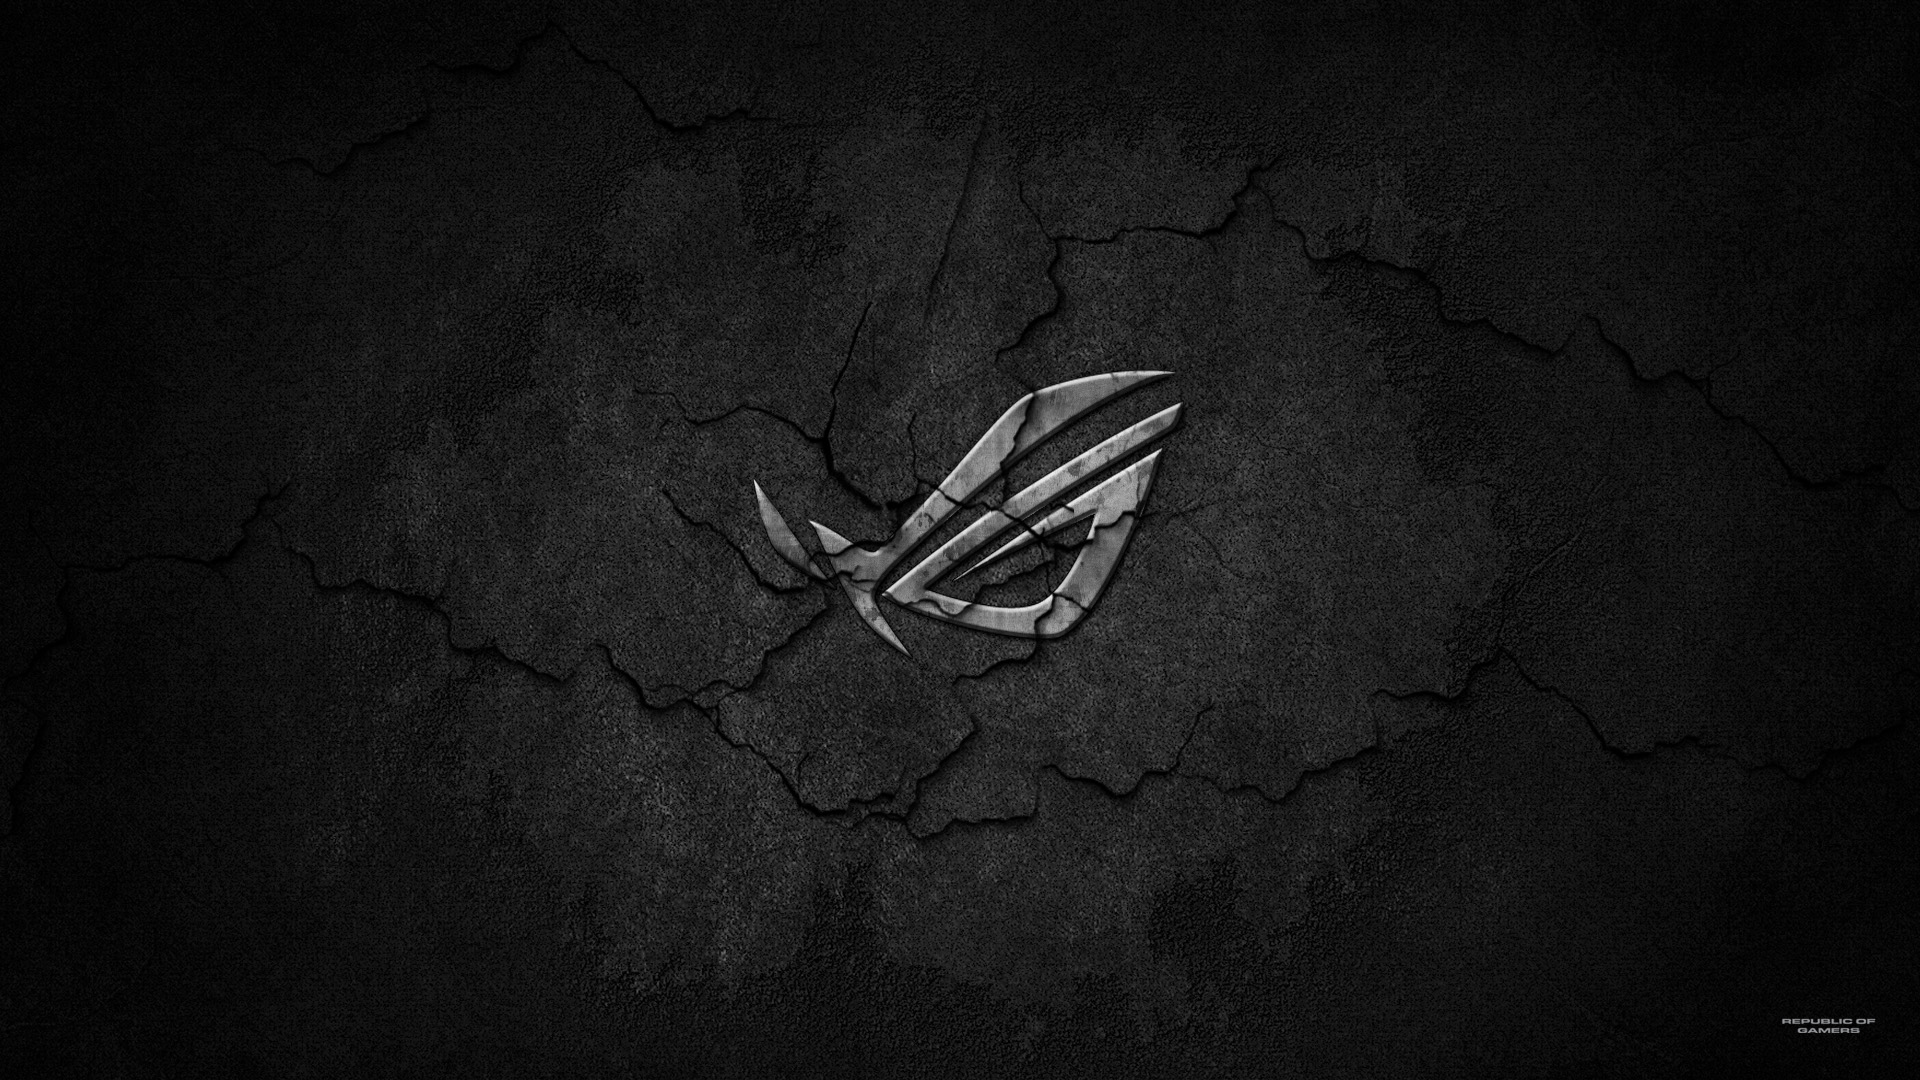 Asus Black Wallpaper: Asus Grey Wallpaper By Cybacreep On DeviantArt